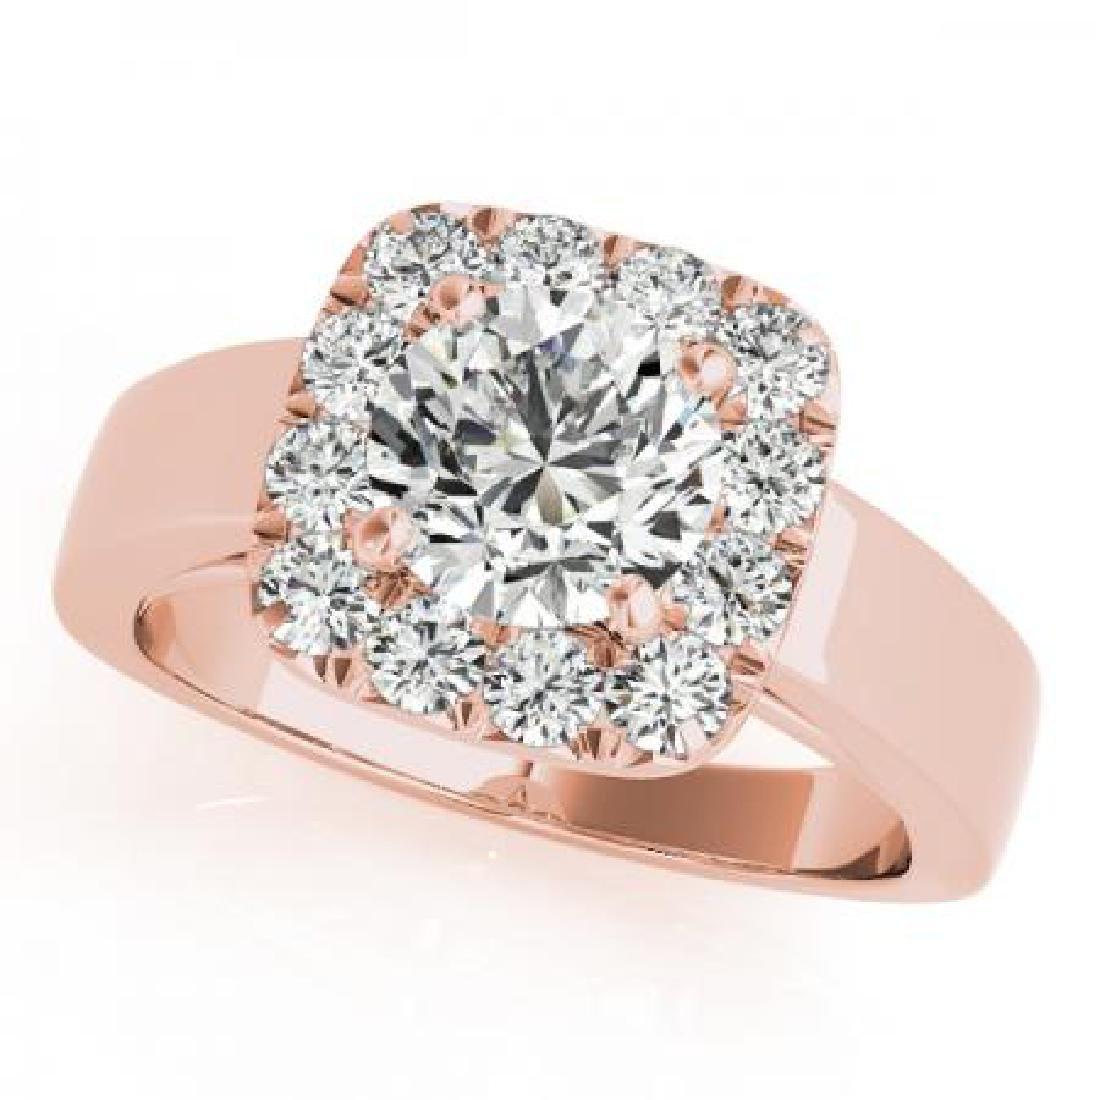 CERTIFIED 18K ROSE GOLD 1.08 CT G-H/VS-SI1 DIAMOND HALO